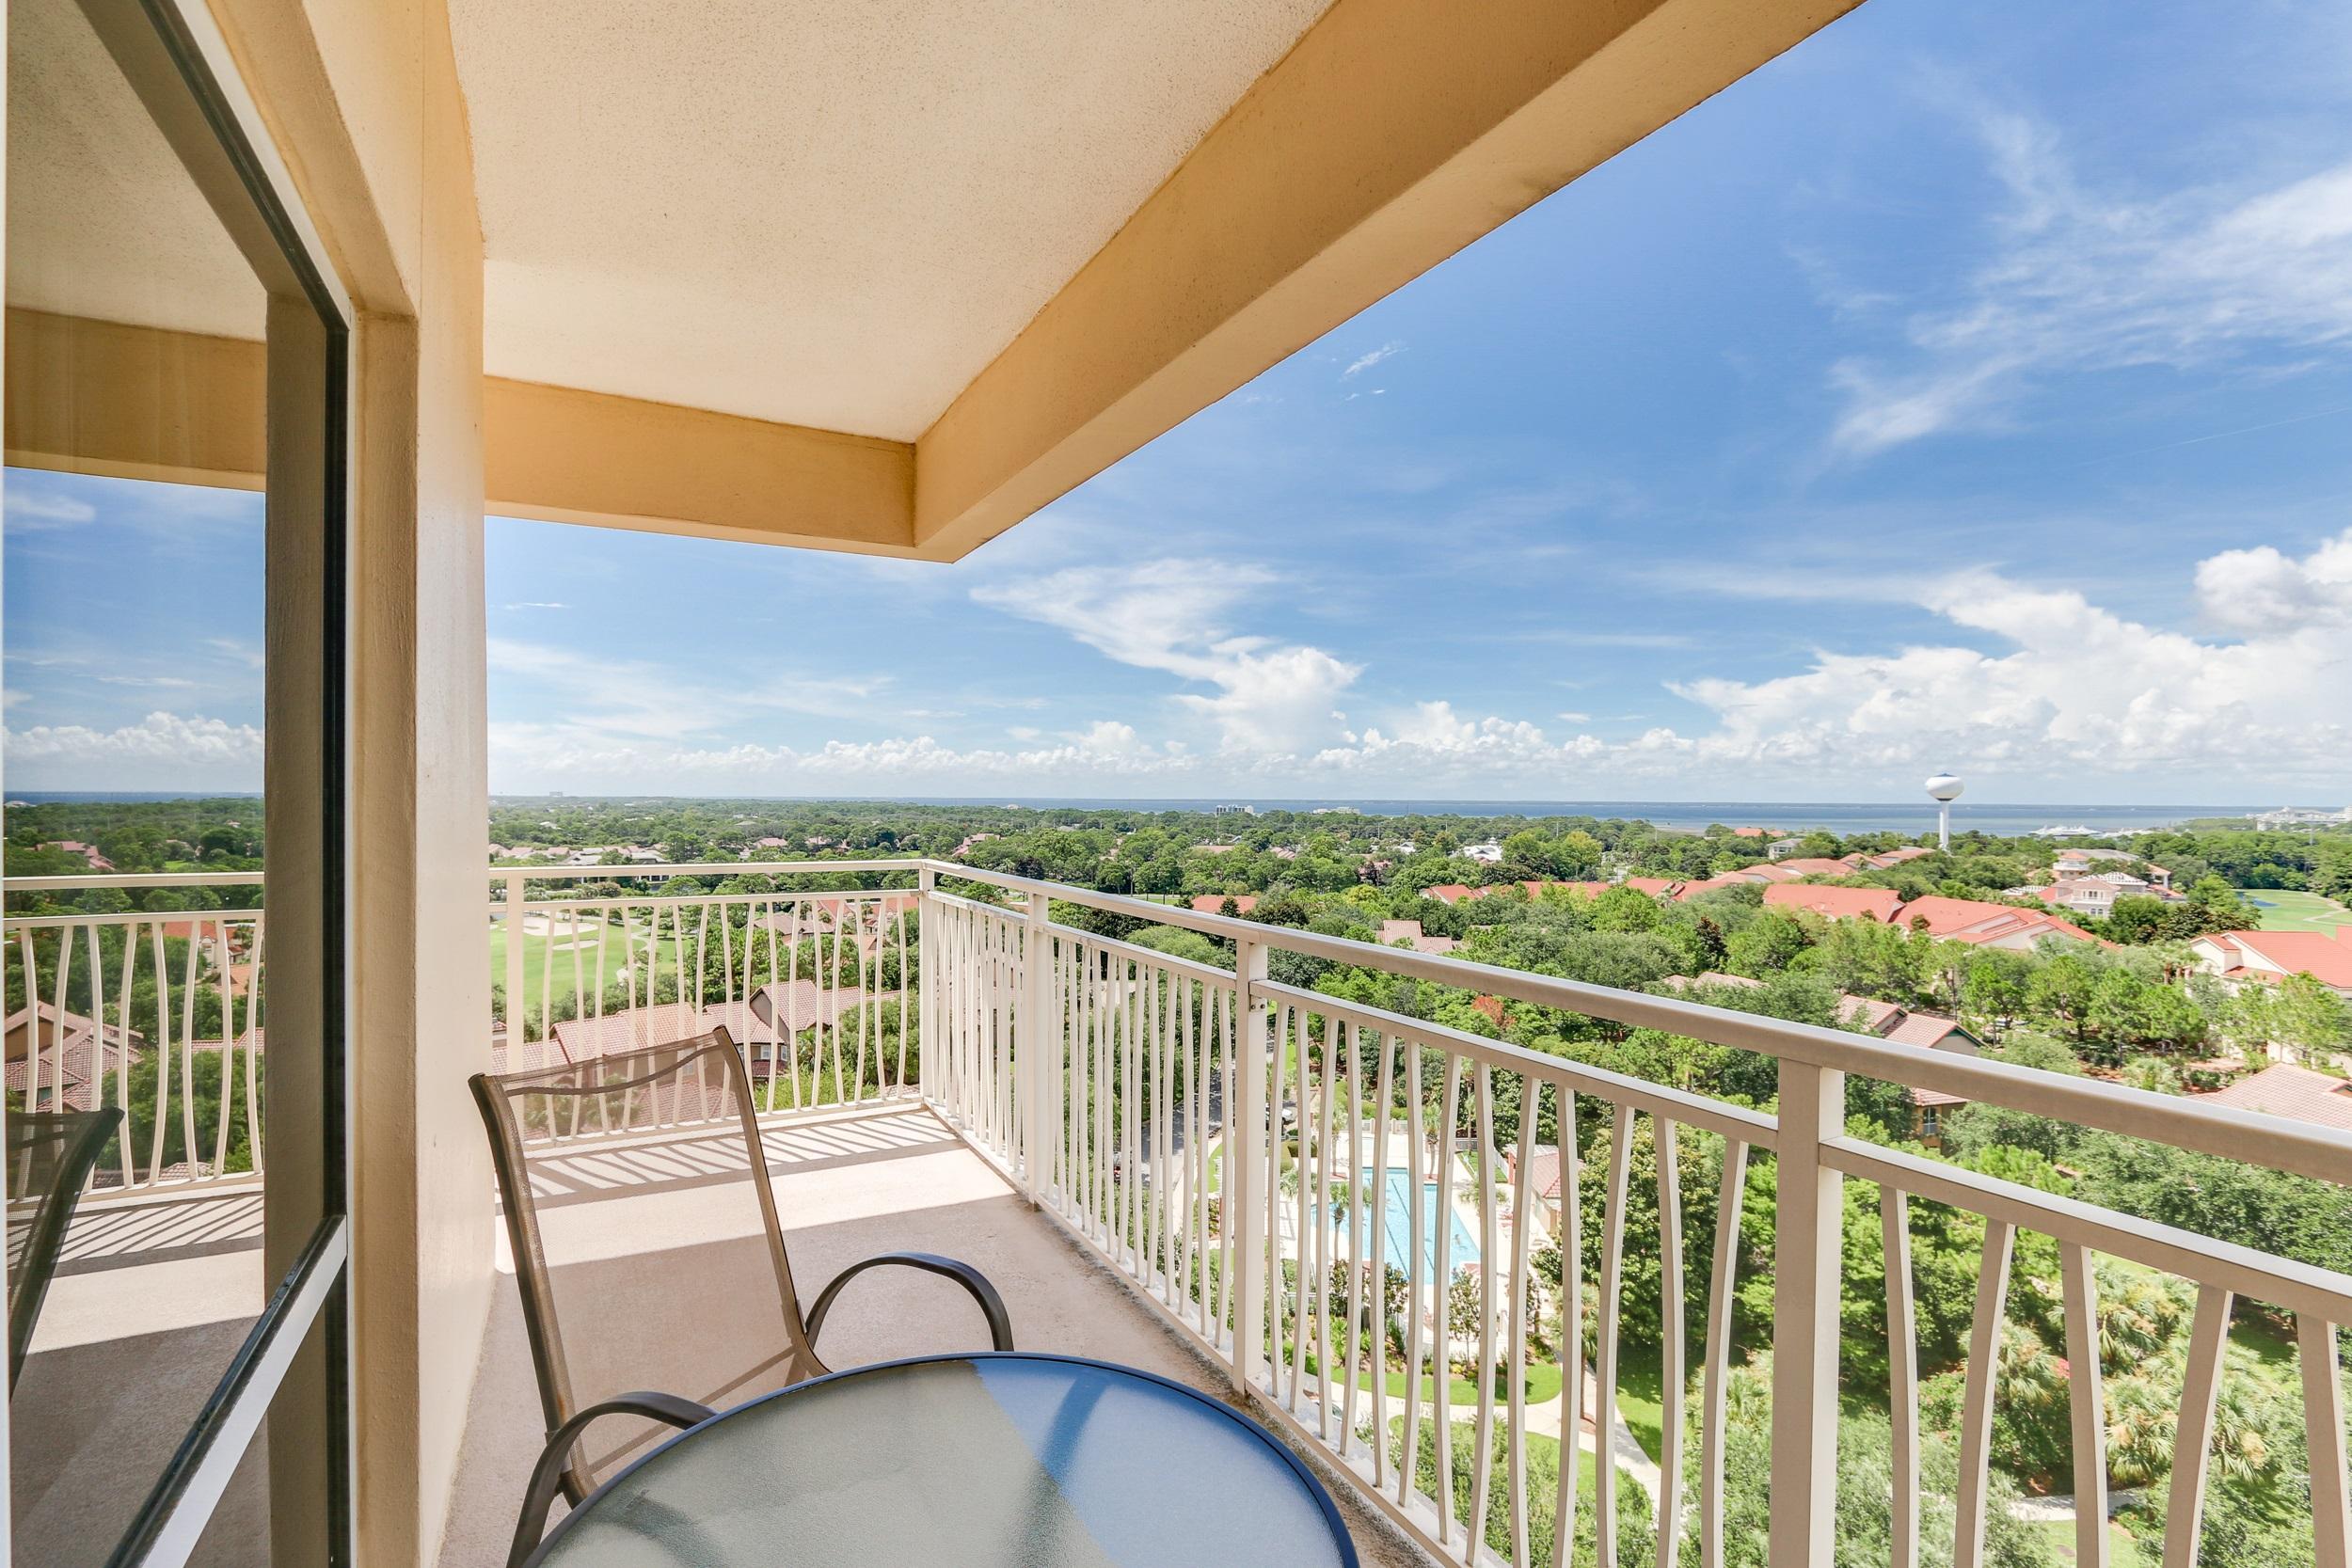 Photo of home for sale at 5000 Sandestin South, Miramar Beach FL